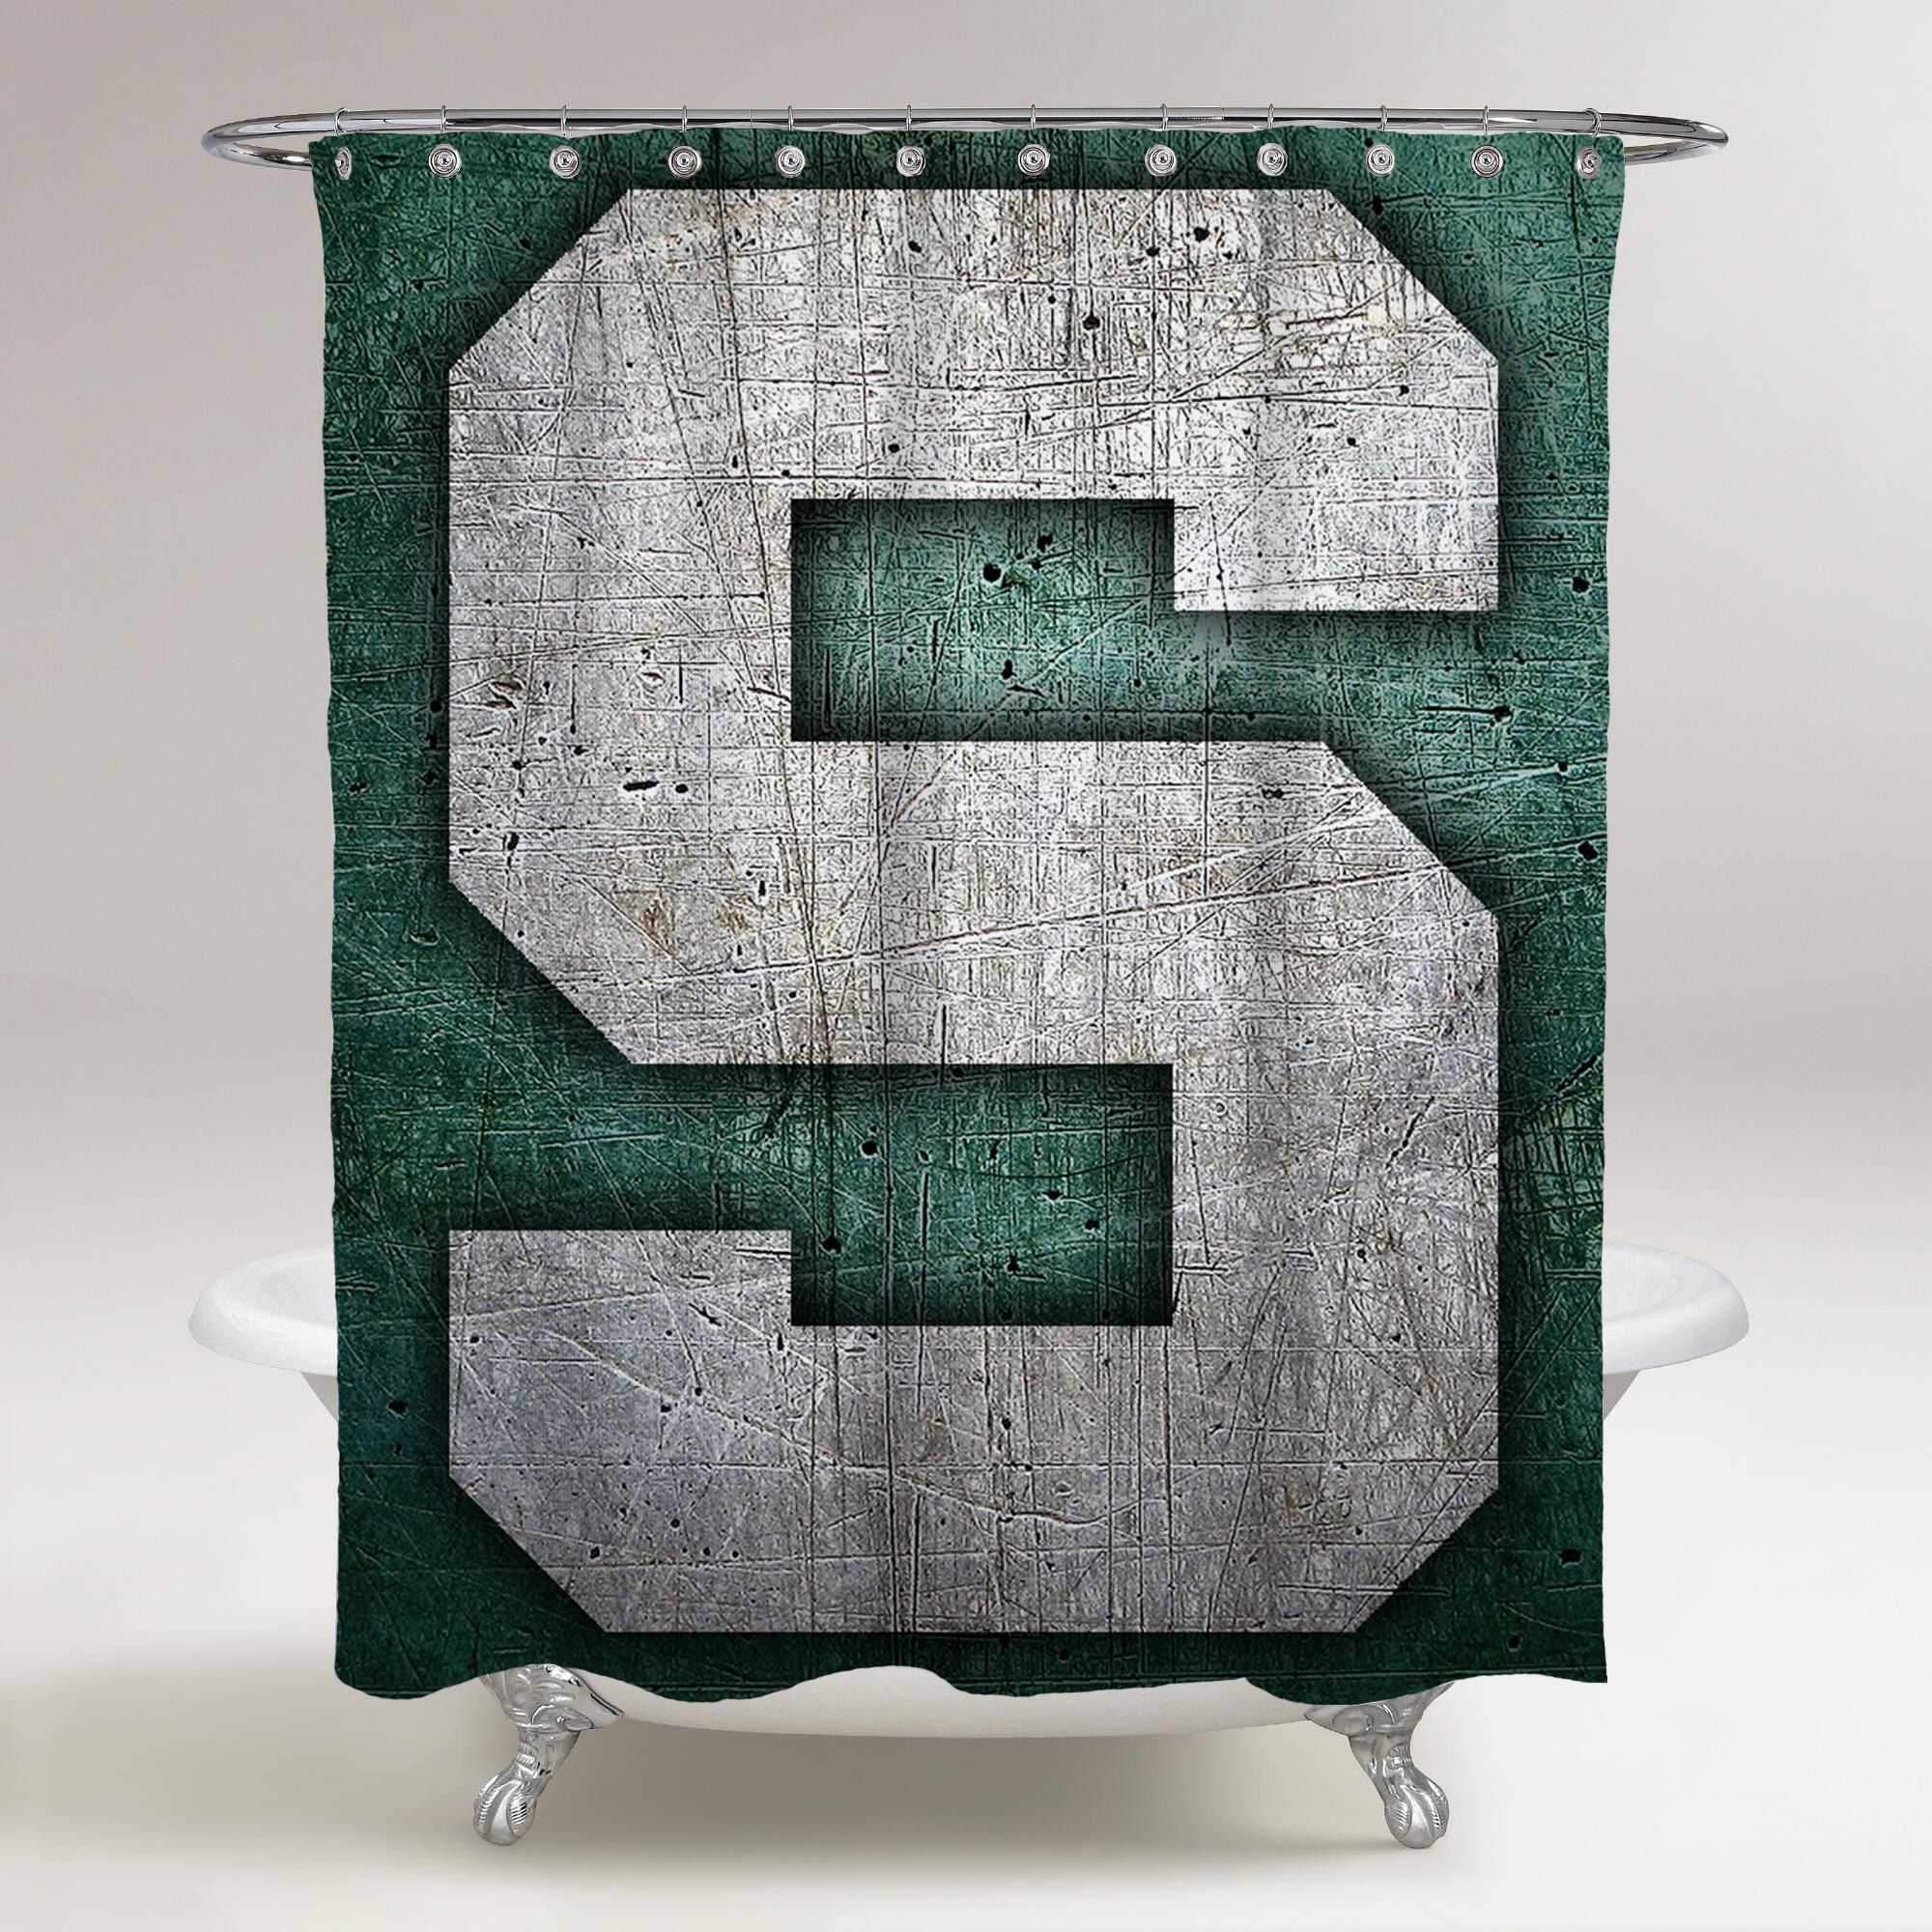 Michigan State Spartans Logo S Printed Shower Curtain Bathroom Decor